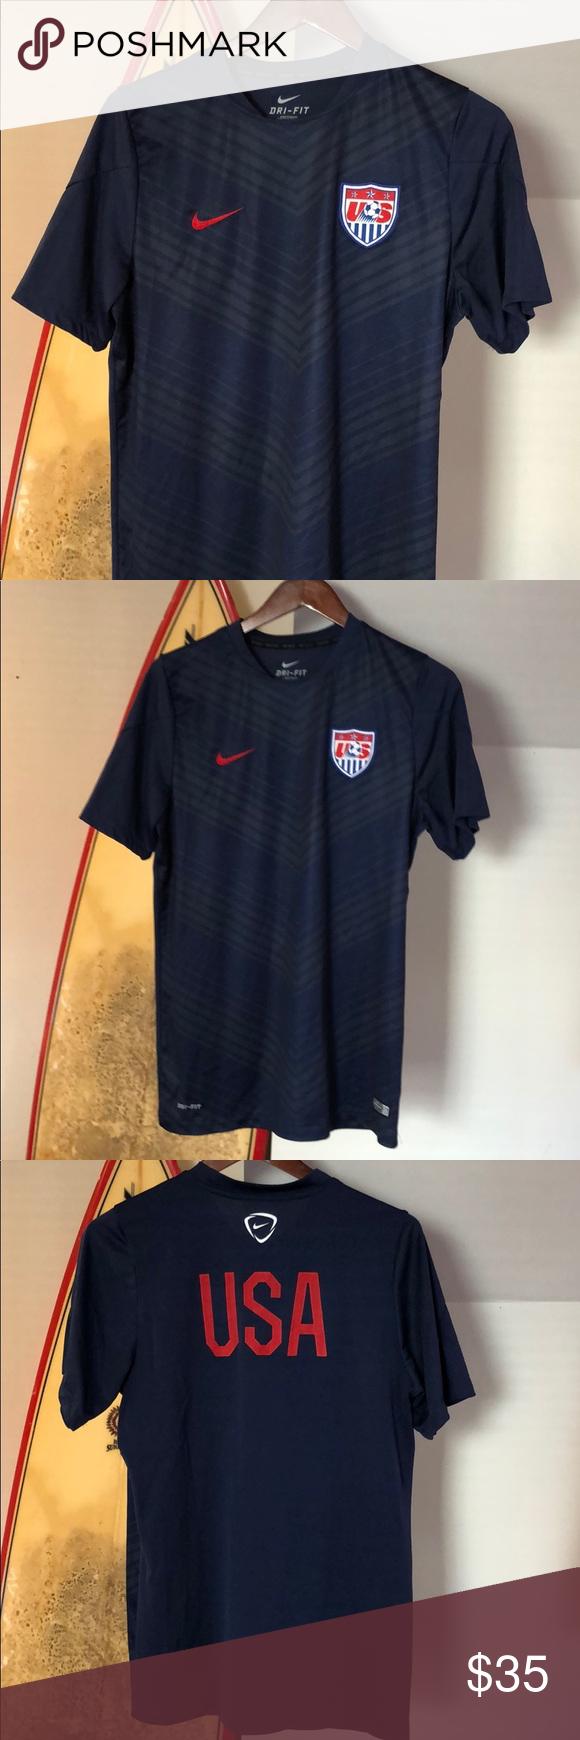 Nike Dri Fit Usa Soccer Shirt Size Large Nike Dri Fit Usa Soccer Shirt Size Large Ignore Converse Adidas Nike Air J In 2020 Usa Soccer Shirt Soccer Shirts Shirt Size